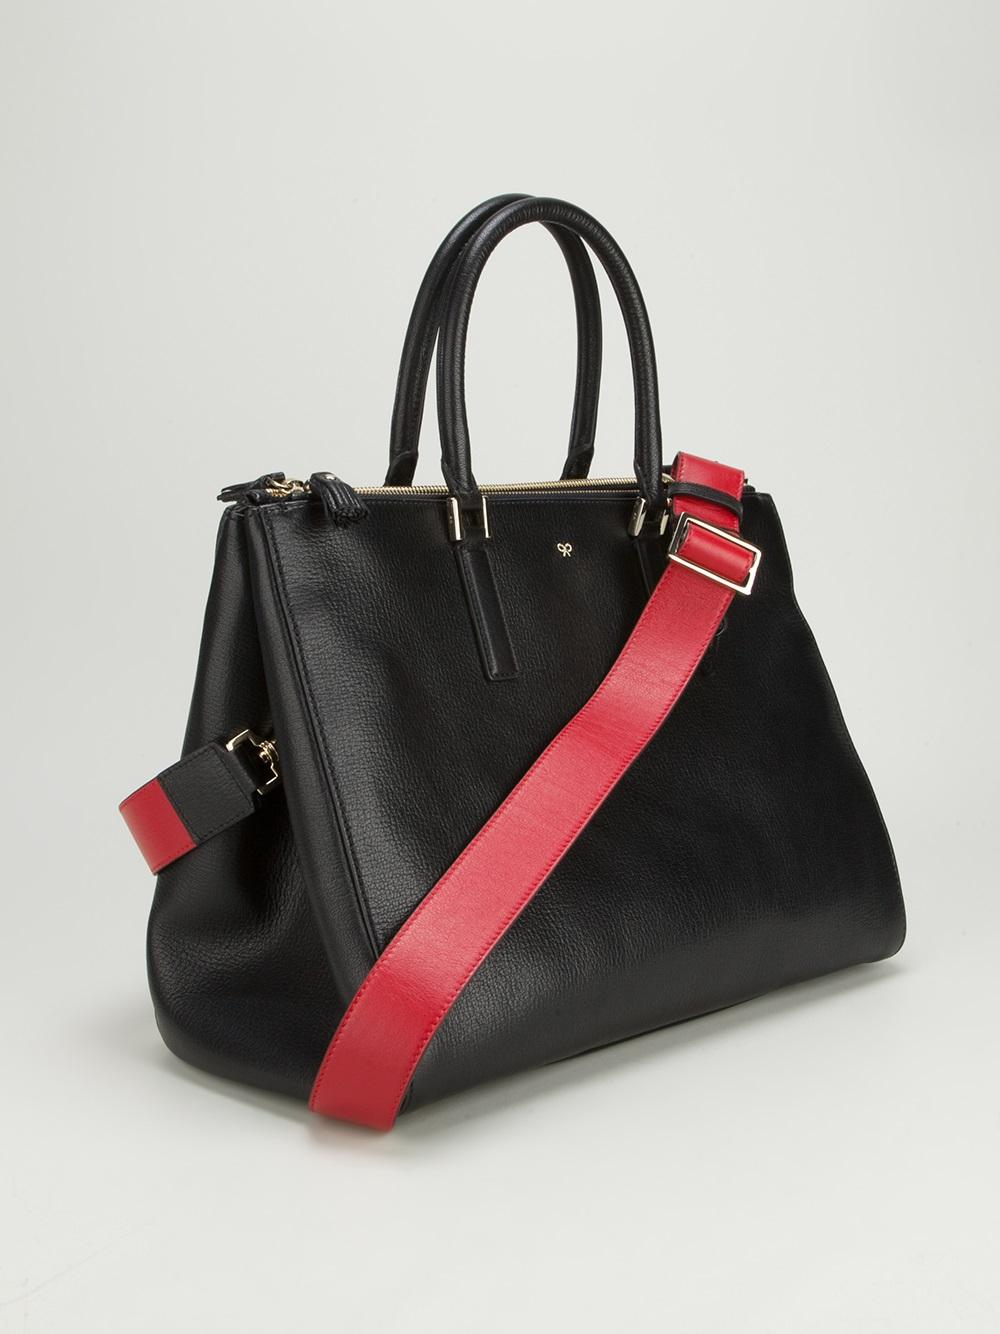 Anya hindmarch Ebury Tote Bag in Black